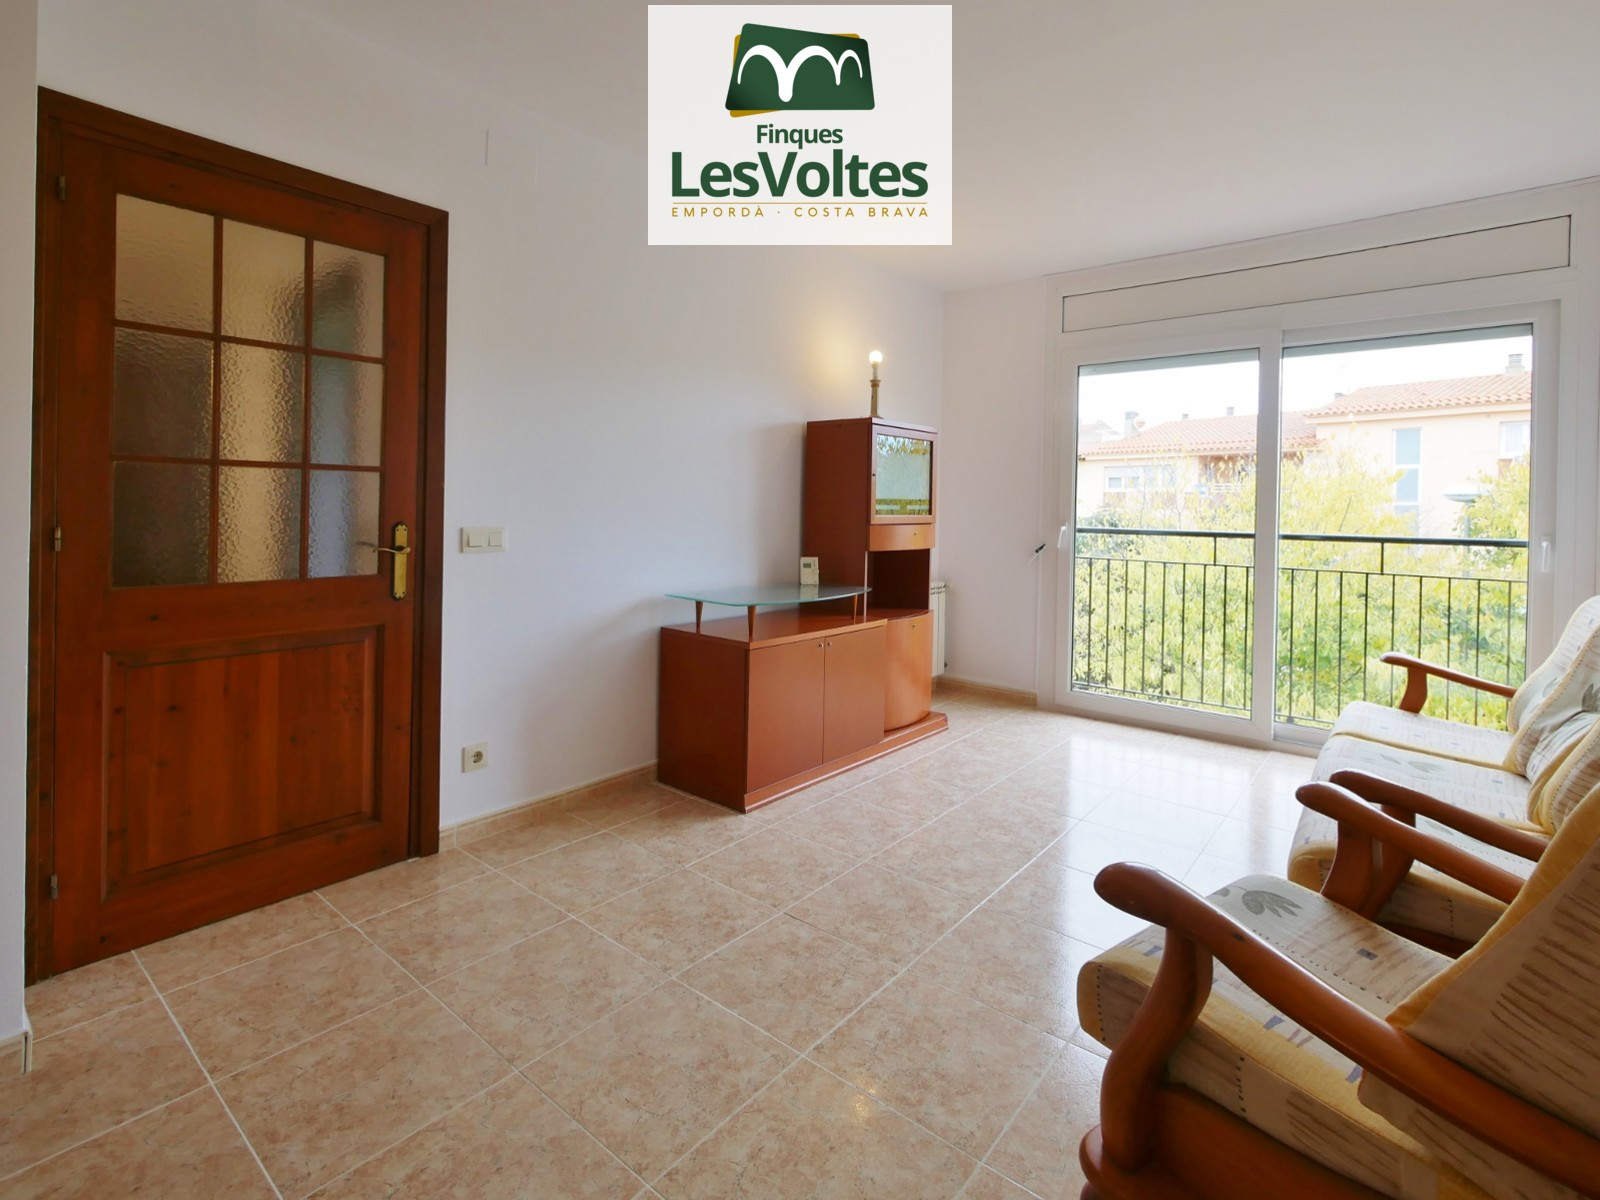 Magnífic pis de 3 habitacions en venda en zona residencial molt tranquil·la al centre de Palafrugell.